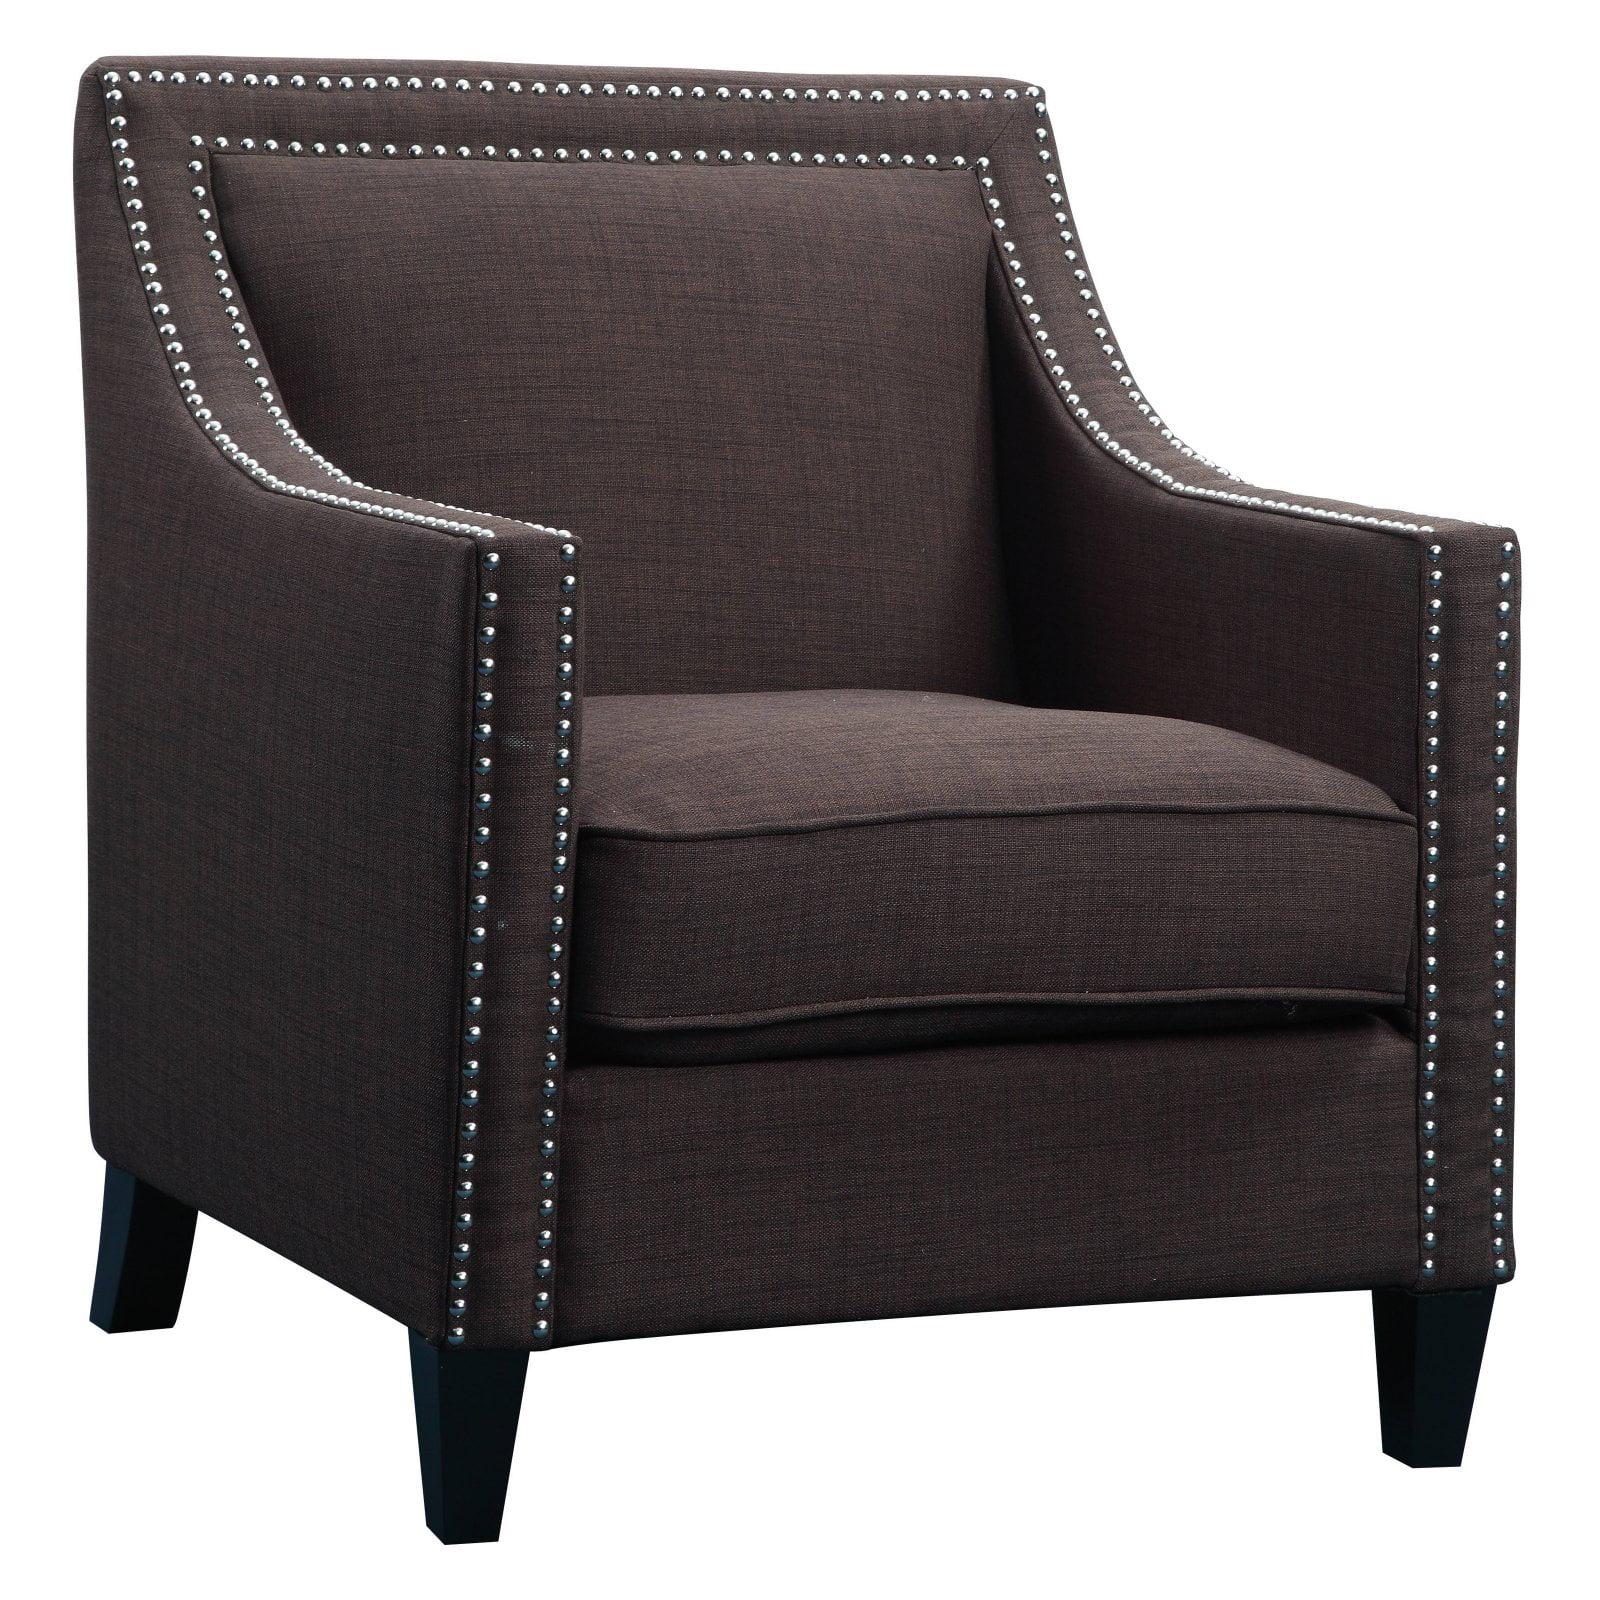 Picket House Emery Chair Heirloom Chocolate